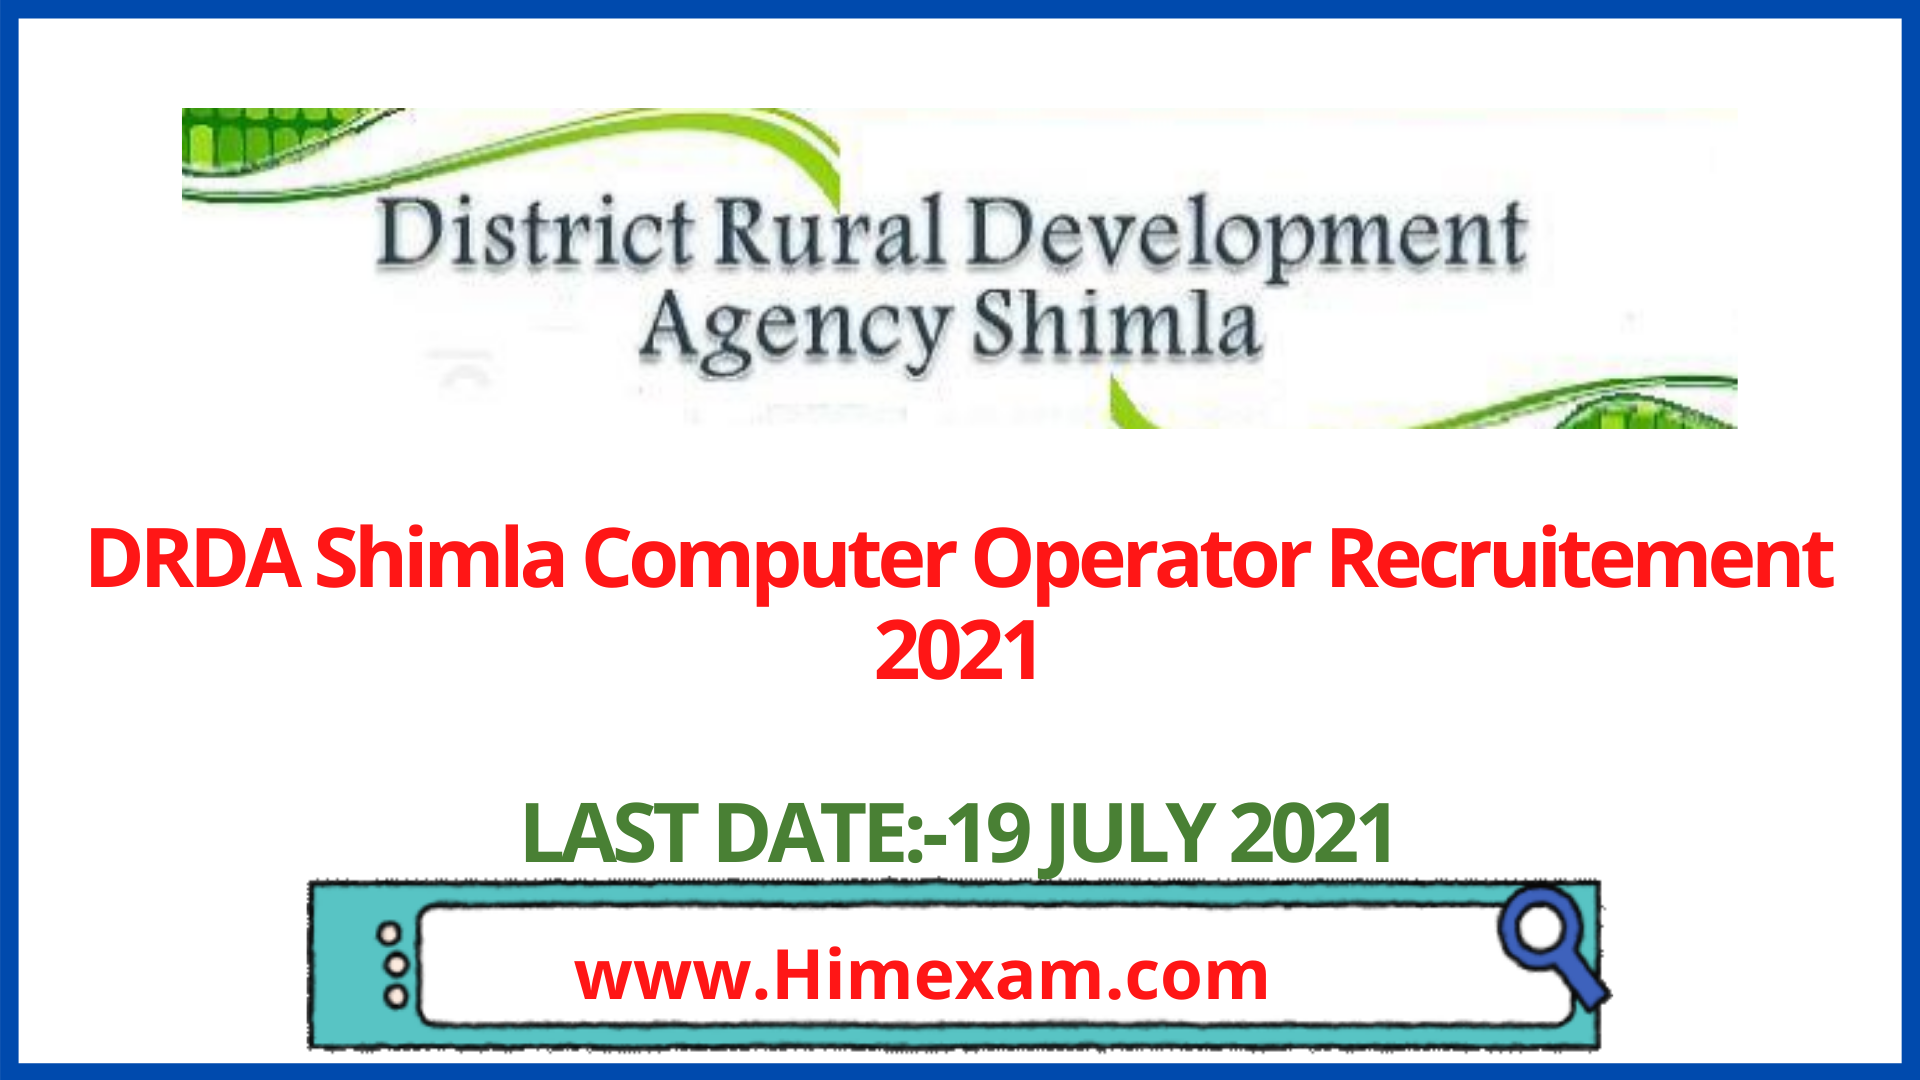 DRDA Shimla Computer Operator Recruitement 2021